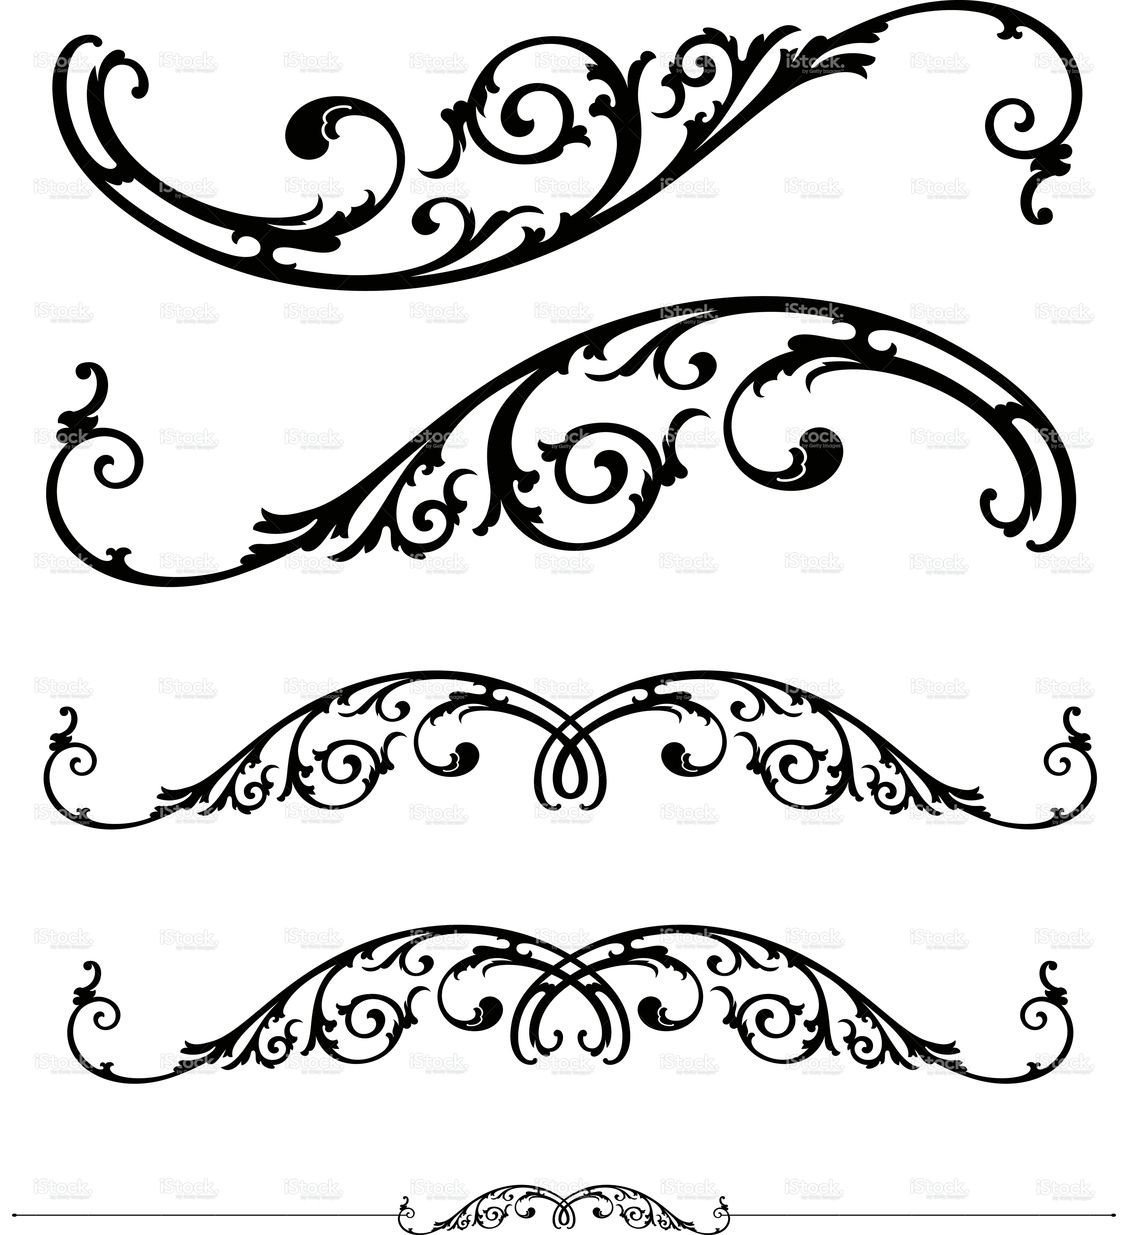 Filigree Design Templates Scroll and Ruleline Design Stock Vector Art